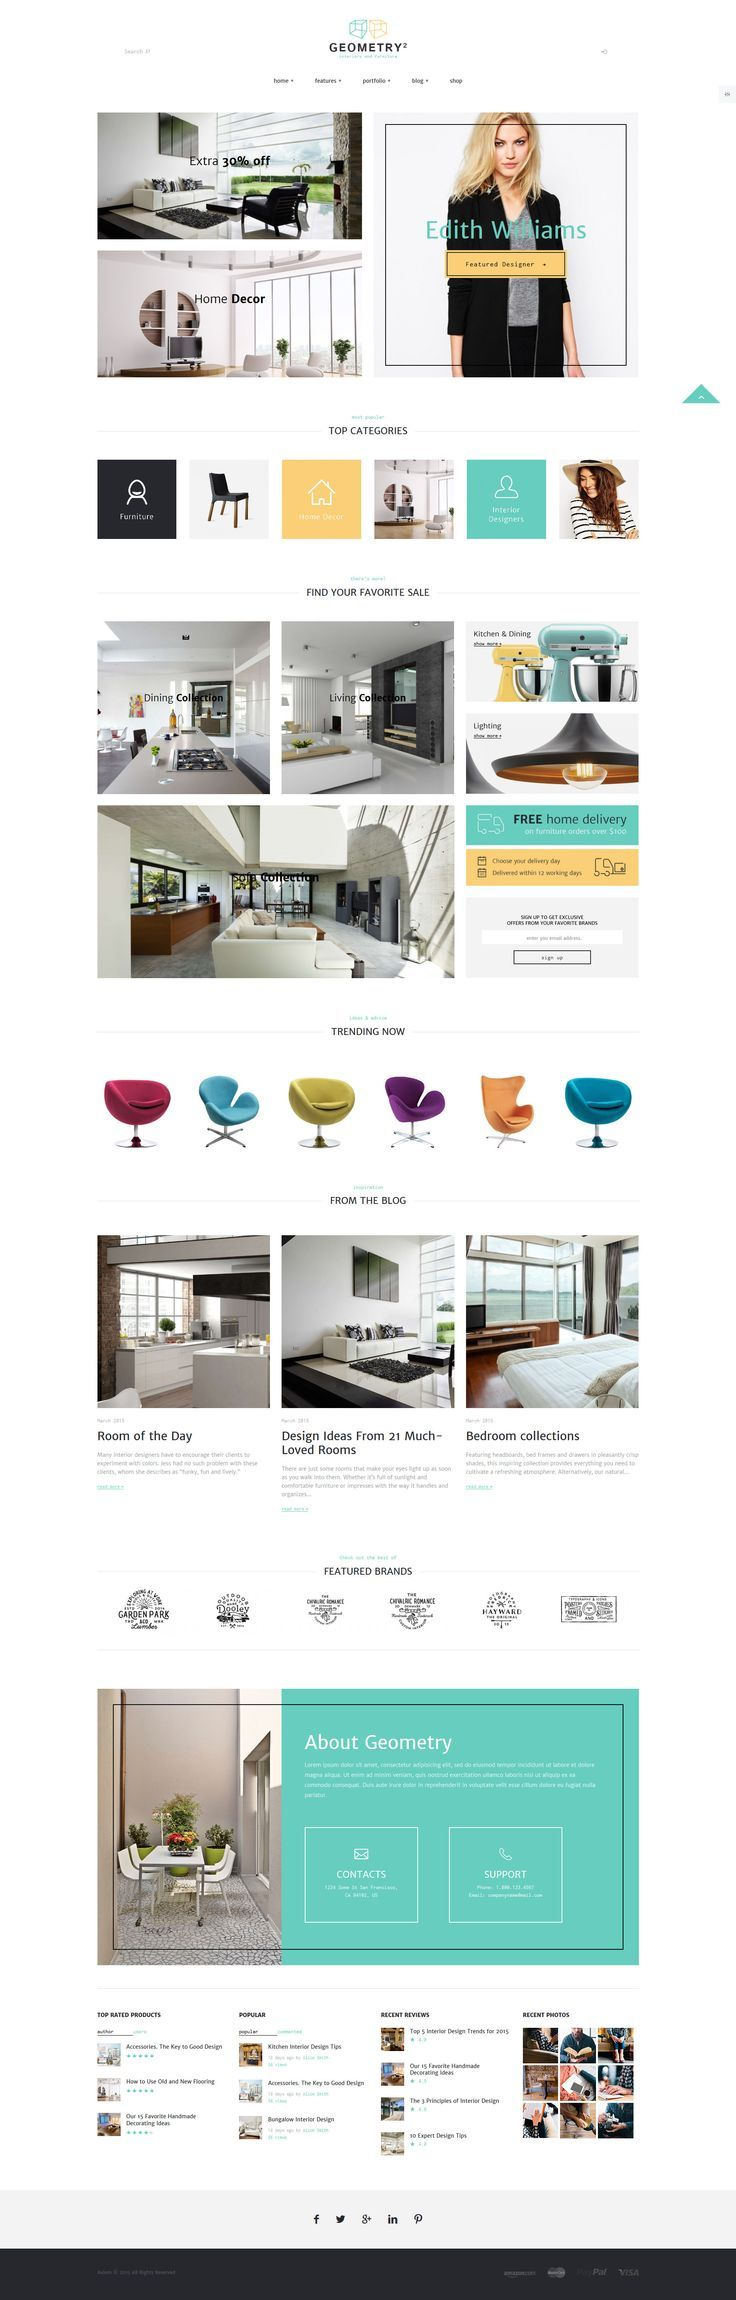 Geometry Interior Design Furniture Layout BookWeb